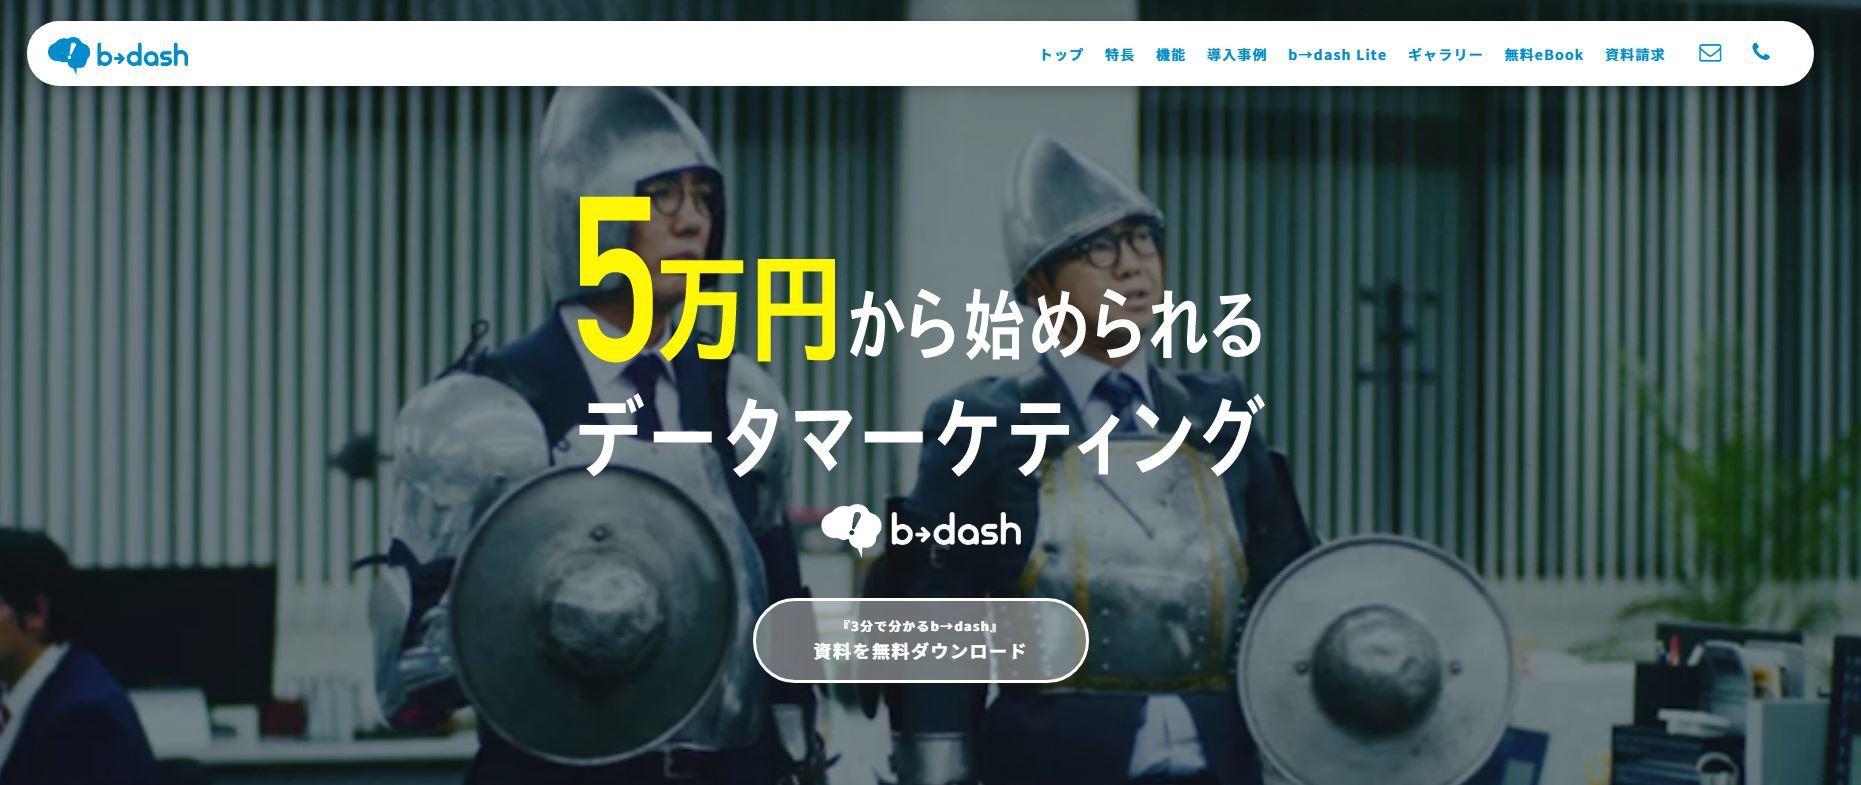 b→dash(ビーダッシュ).JPG